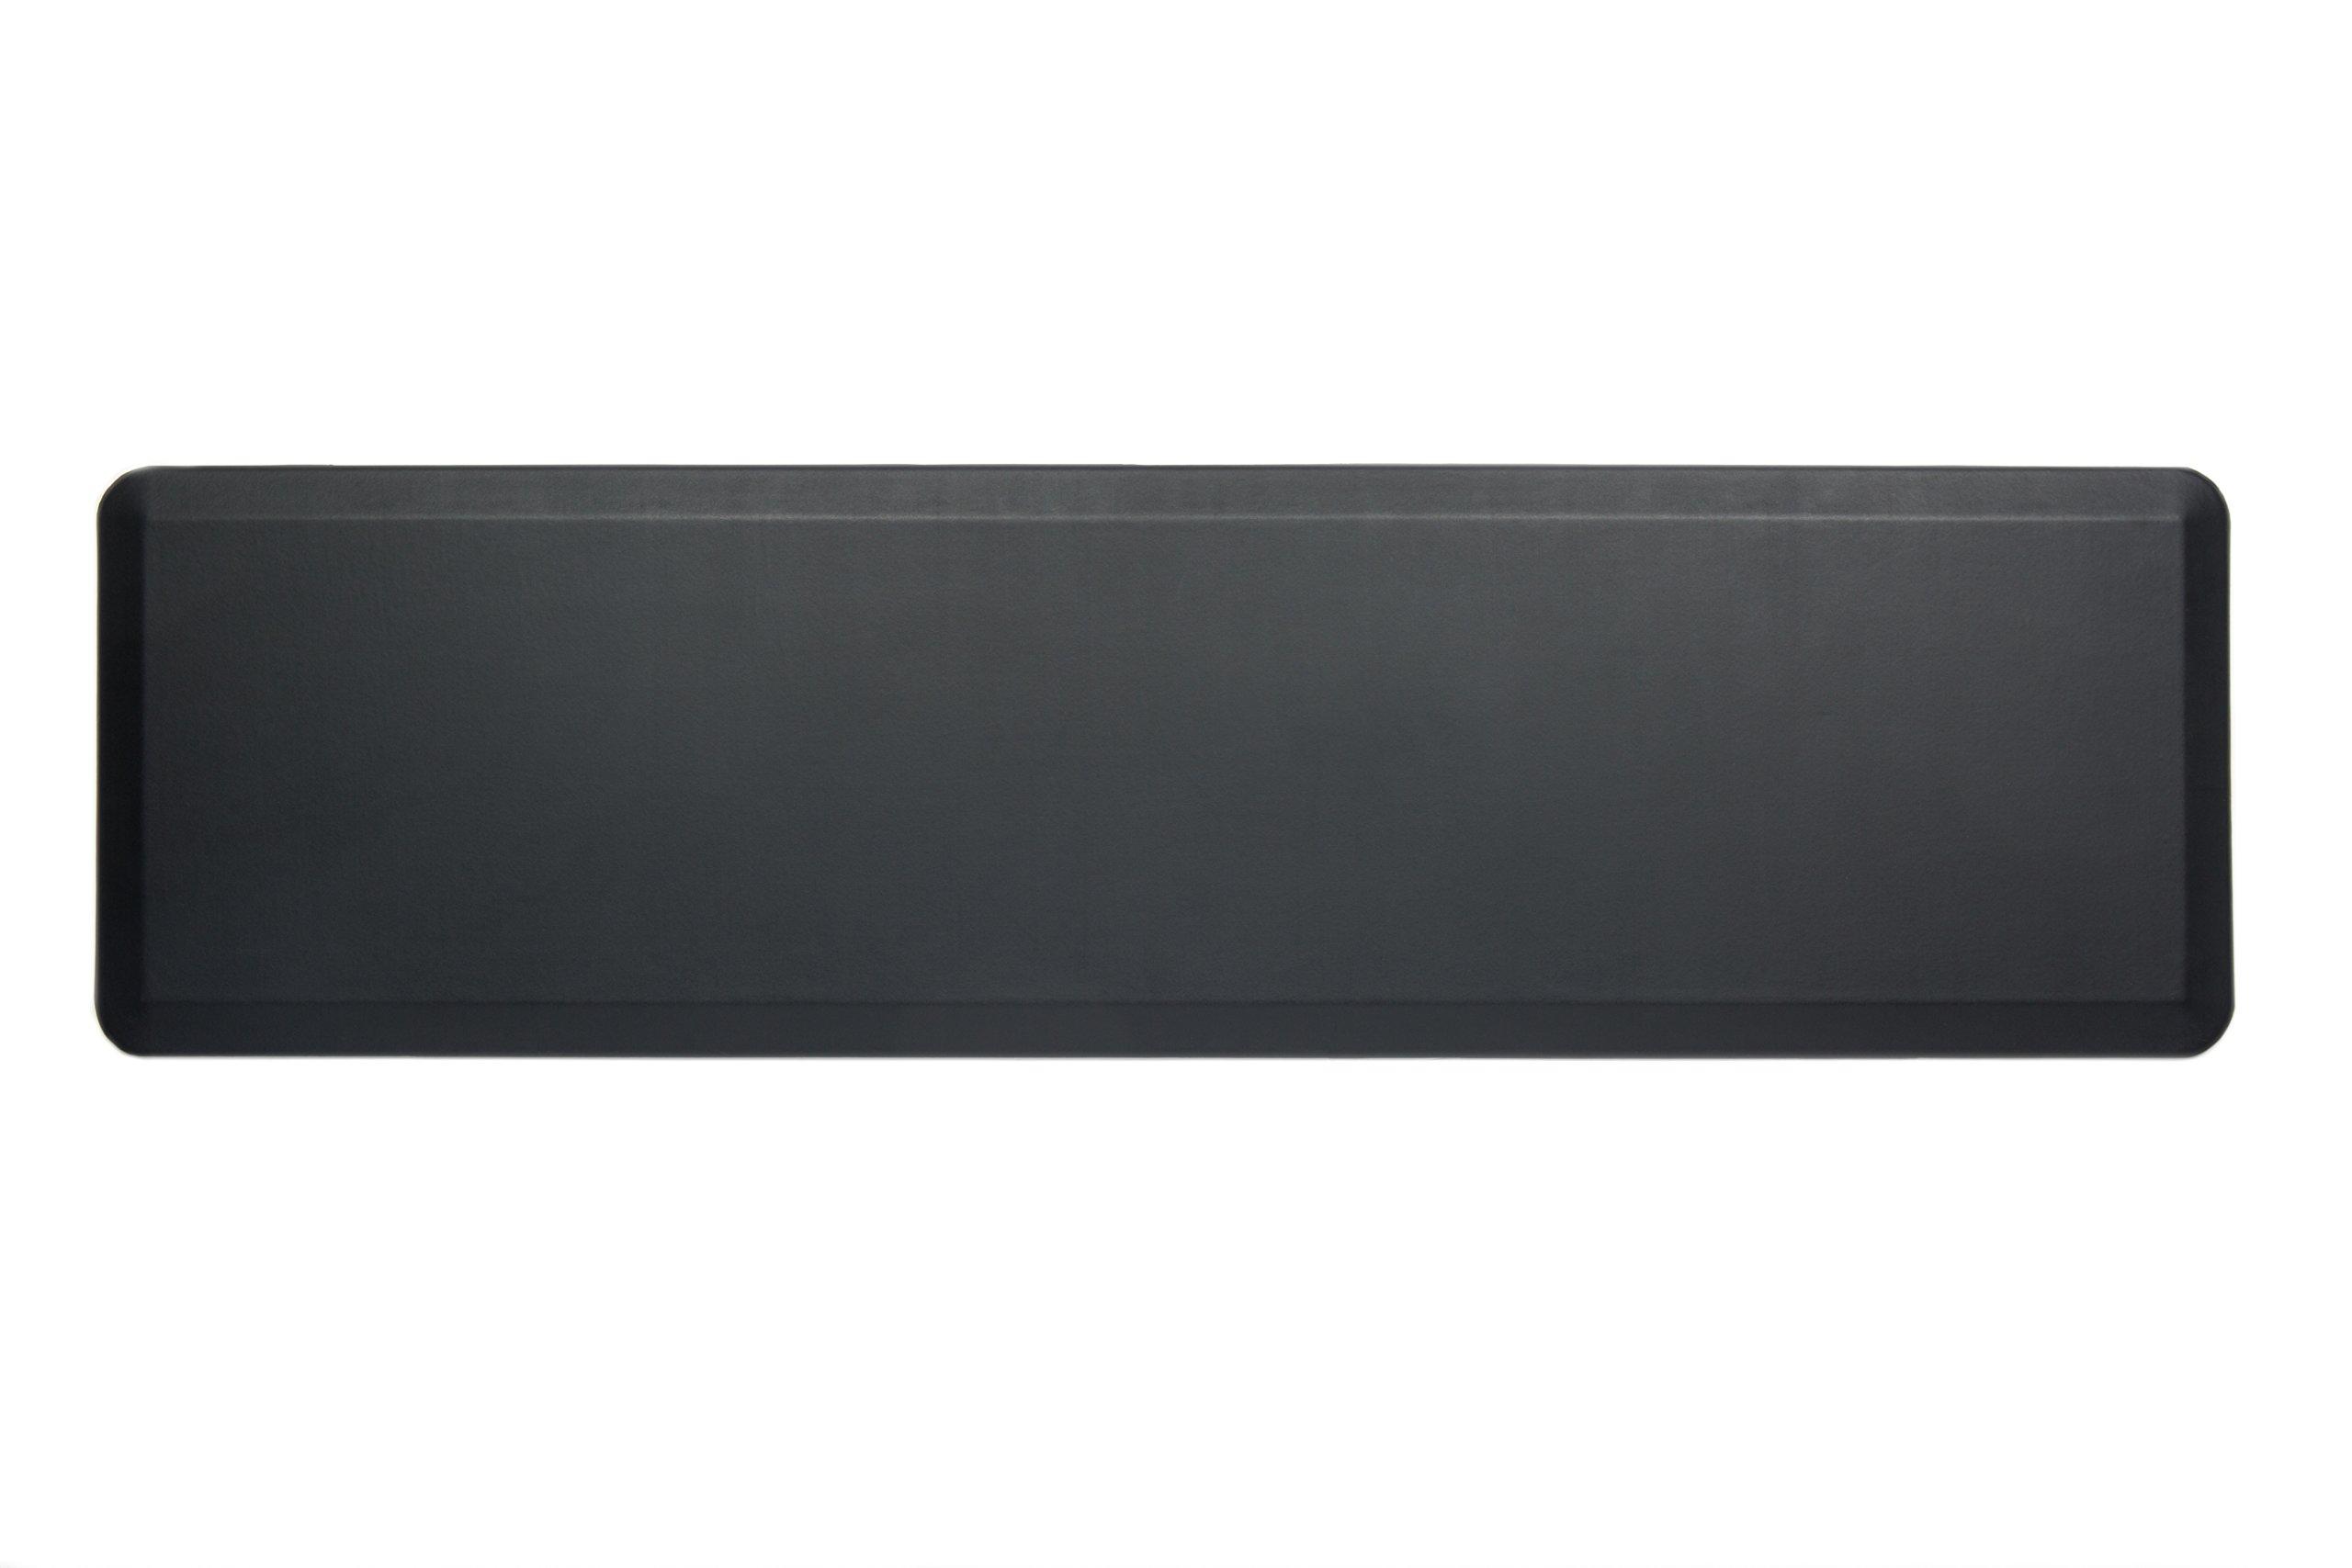 Imprint Comfort Mats CumulusPRO Professional Grade Mat, 20'' x 72'' x 3/4'', Black by Imprint® Comfort Mats